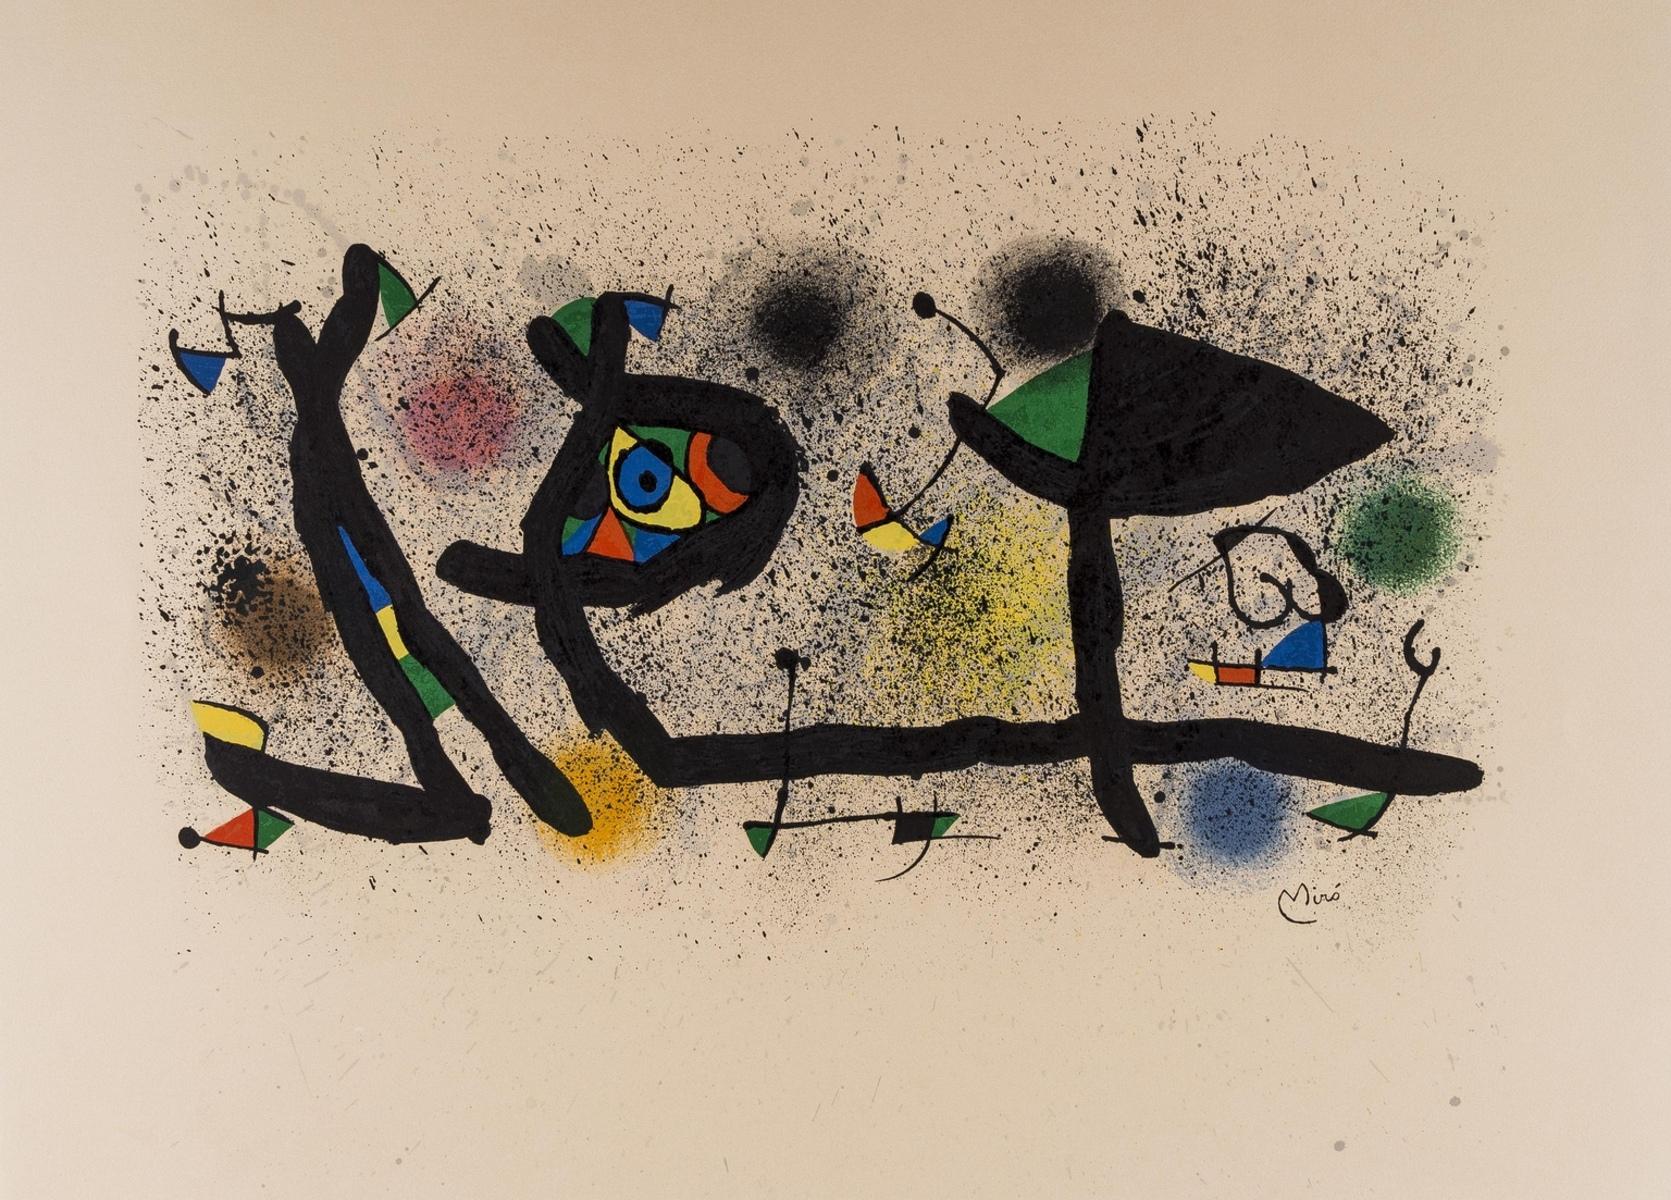 Joan Miro (1893-1983) Sculptures (Mourlot 950)